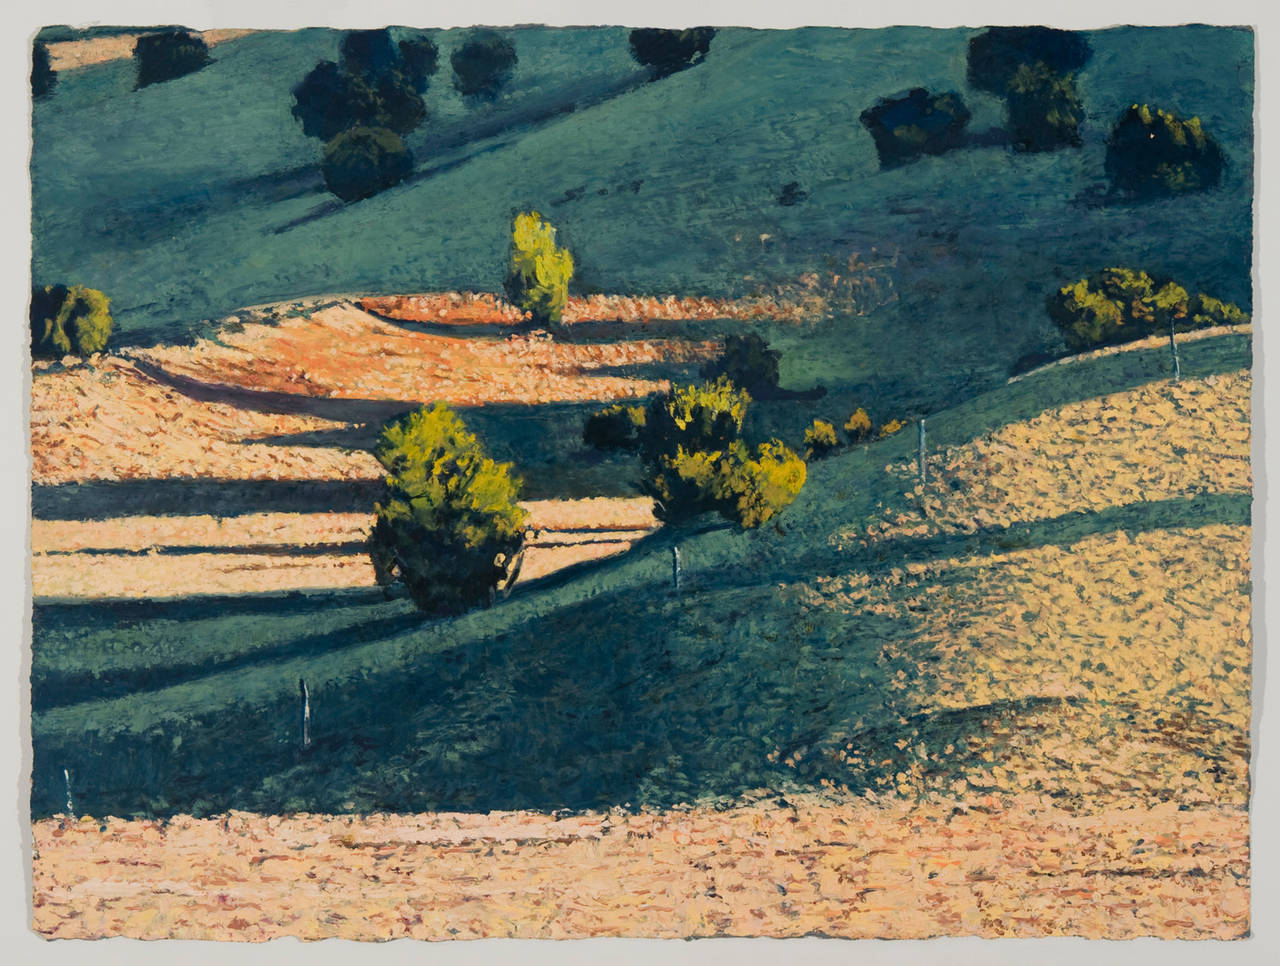 Jim Woodson Landscape Painting - Temporally Compatible Conceptions No. 2